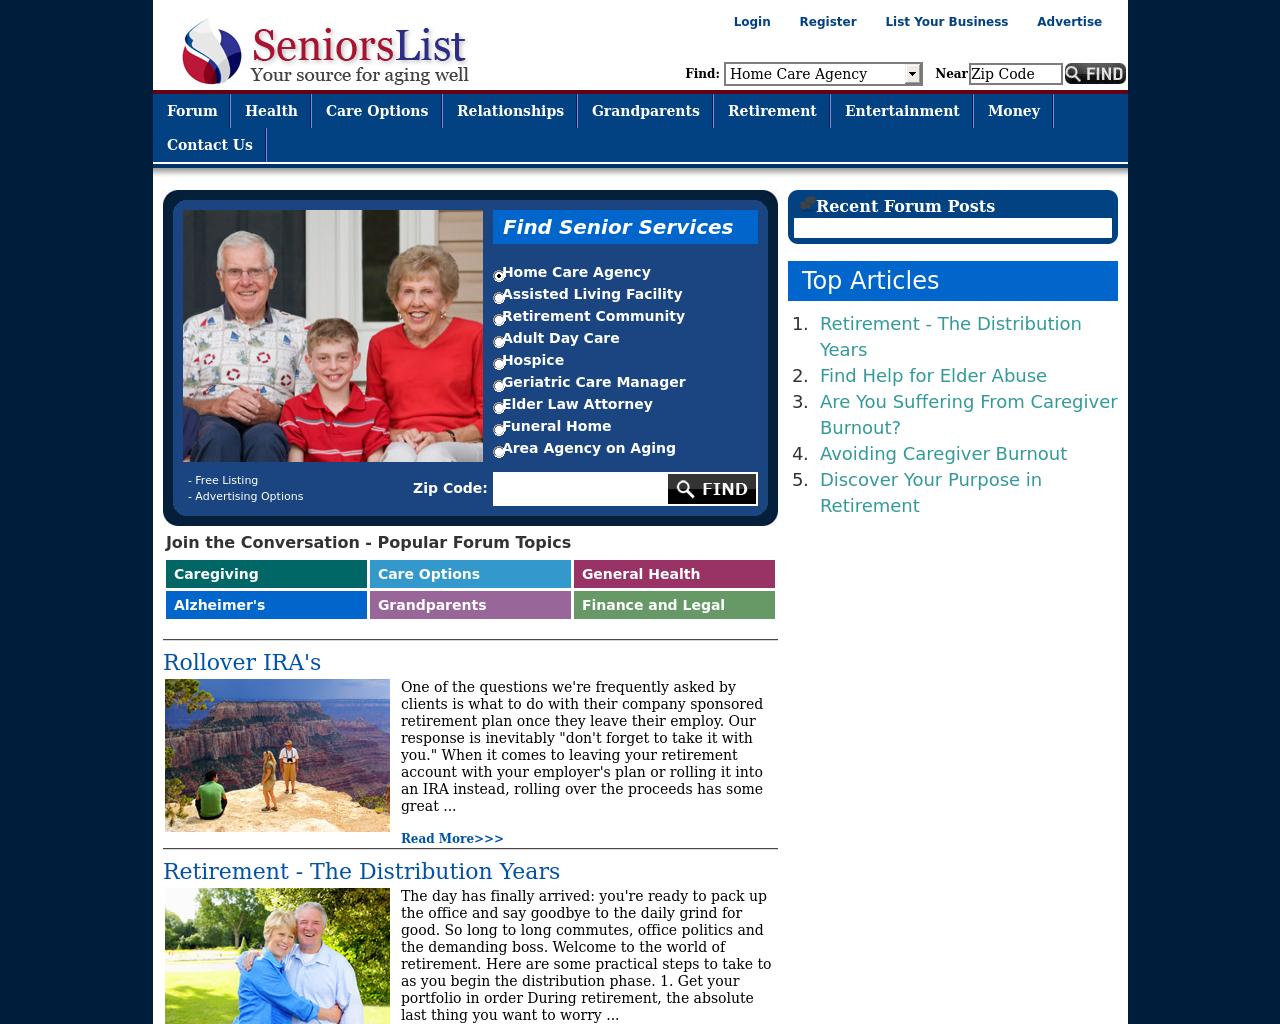 SeniorsList-Advertising-Reviews-Pricing